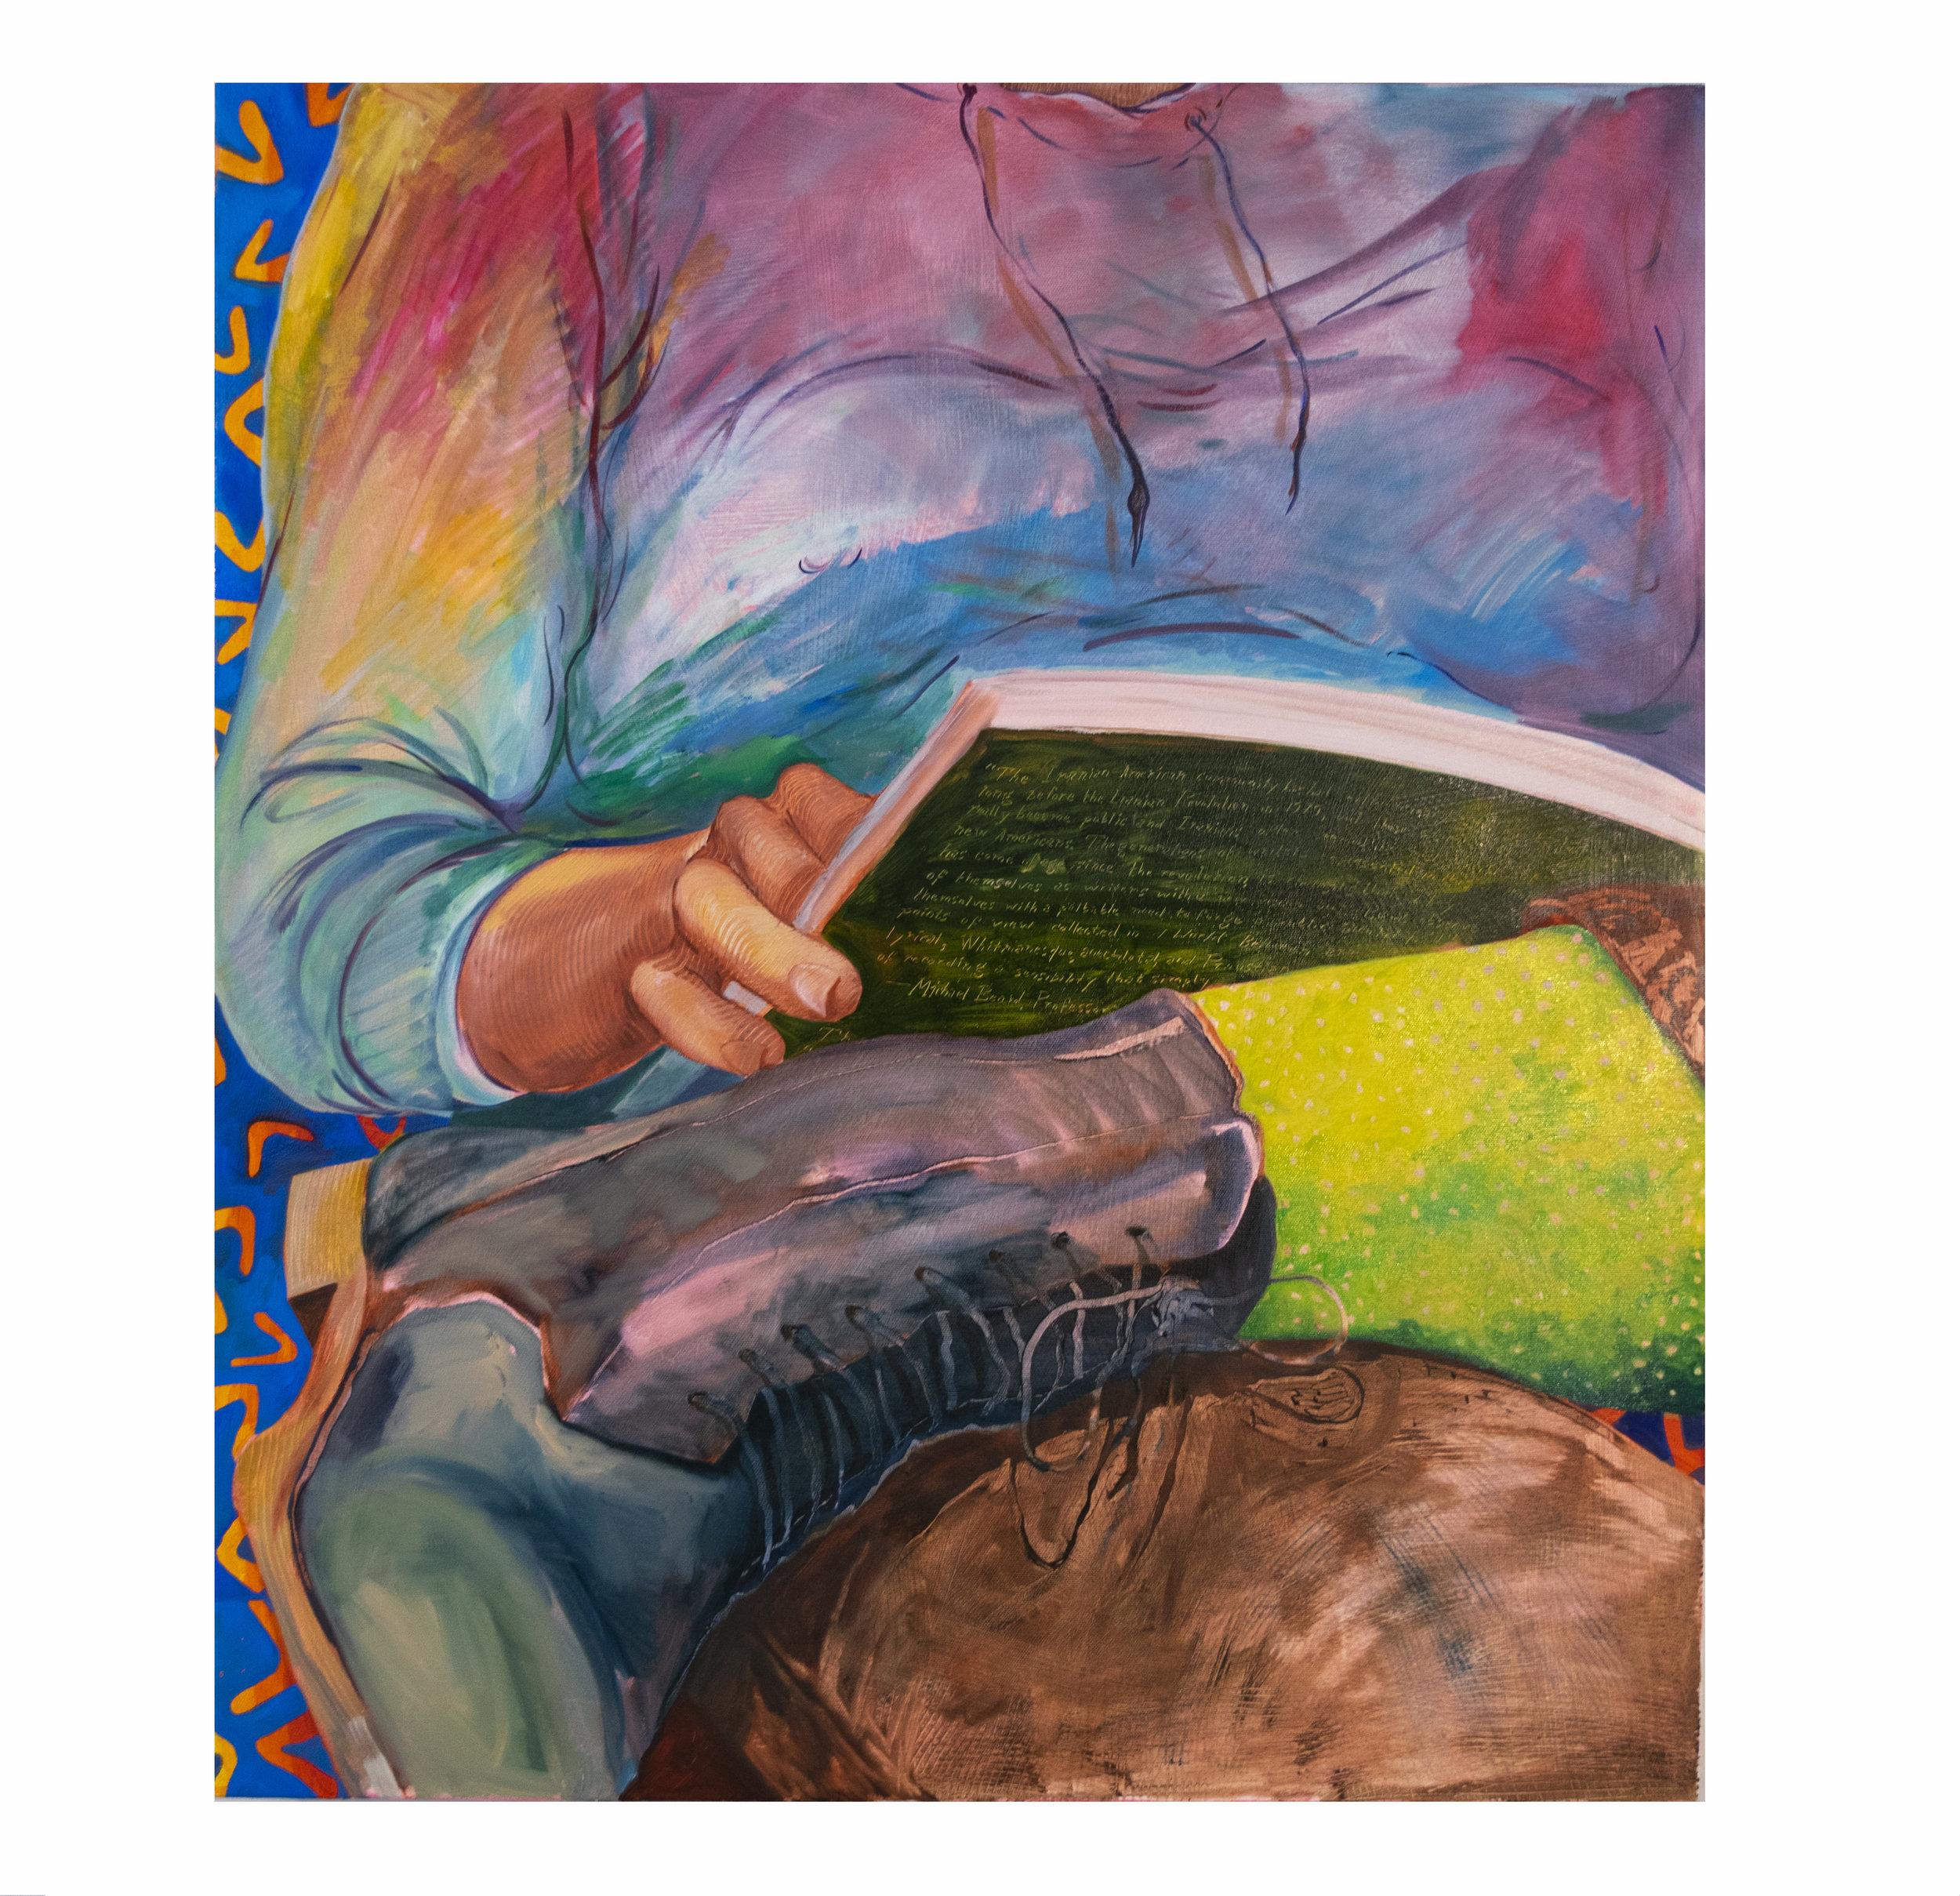 Aryana's Book